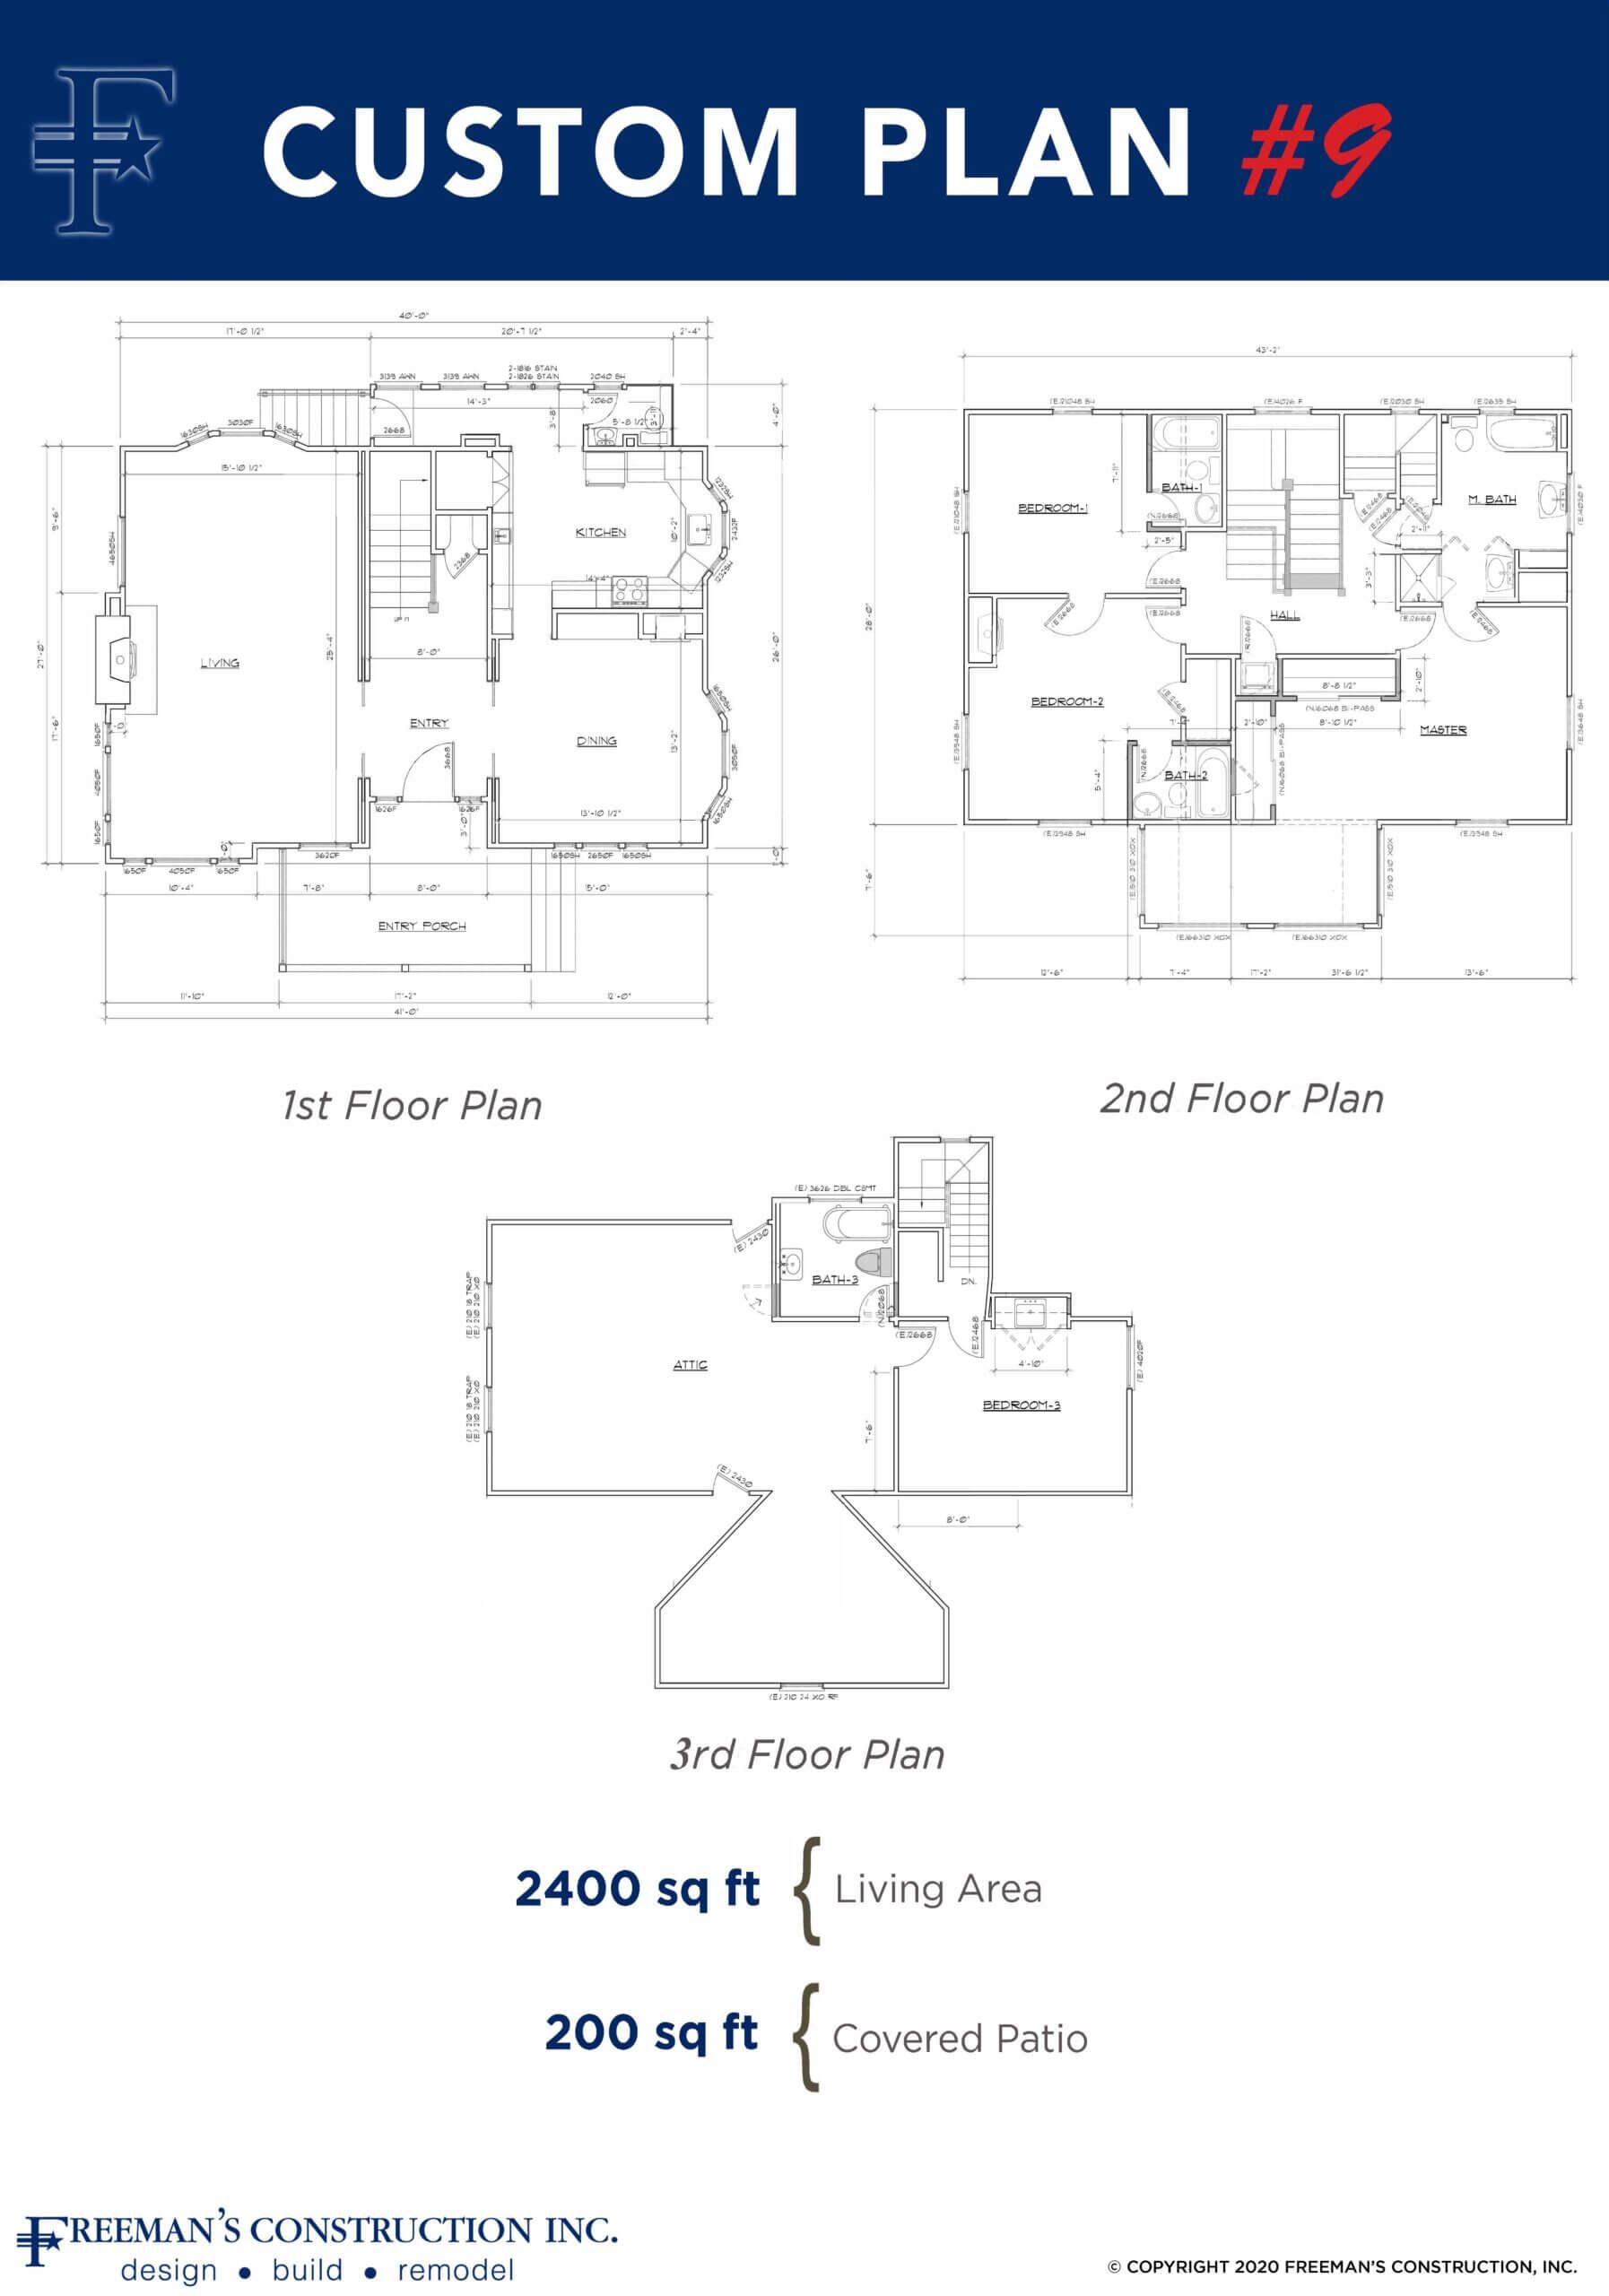 custom-home-floor-plan-9-in-san-diego-county-ca-by-freemans-construction-inc